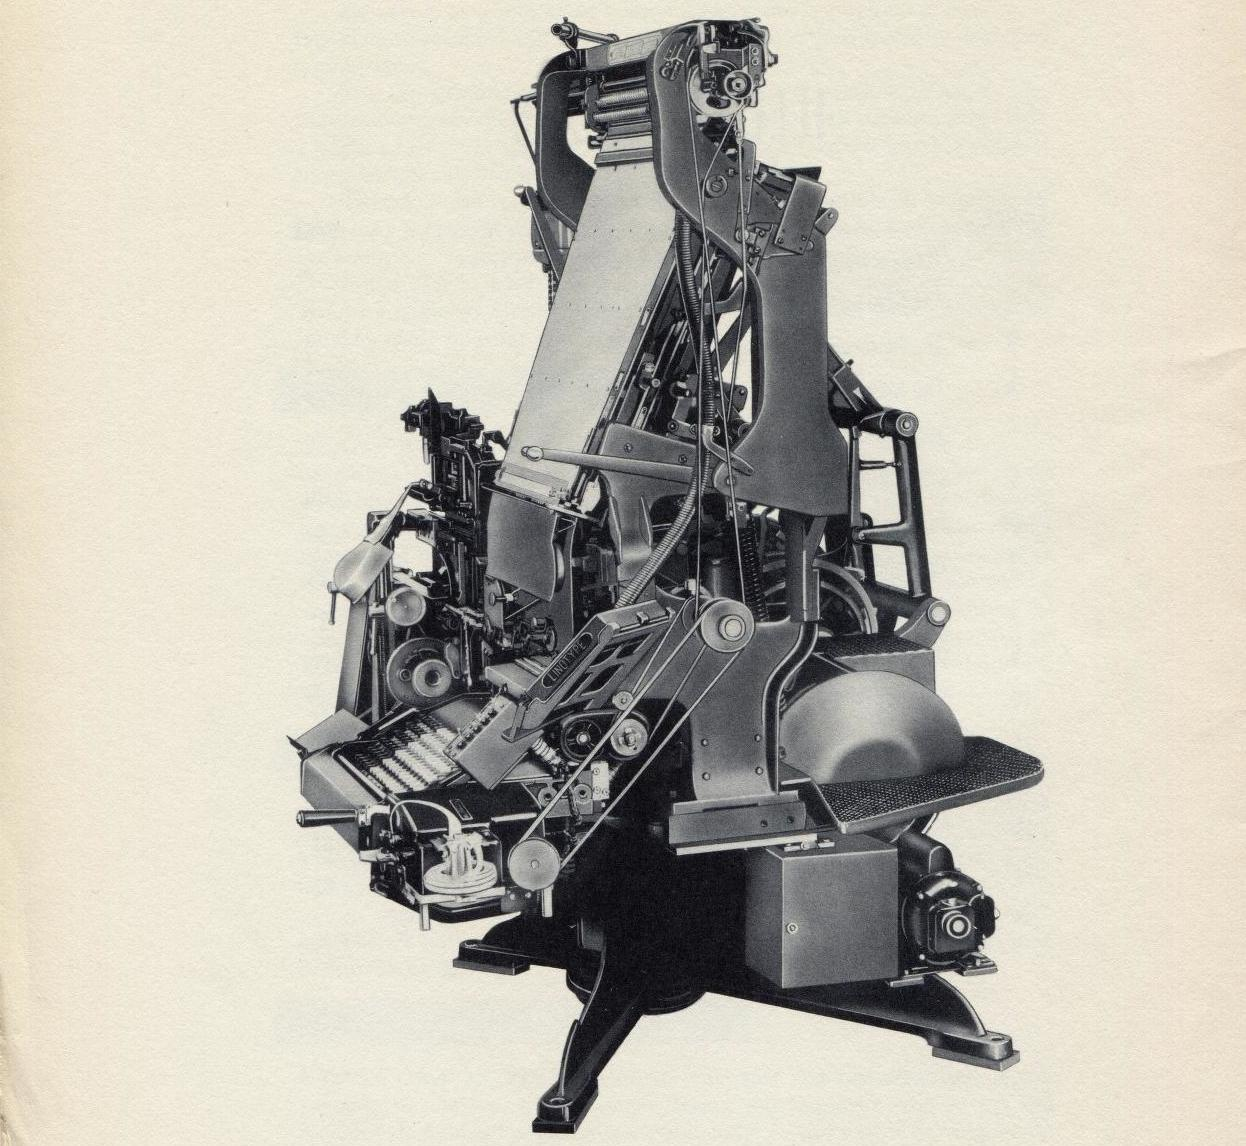 linotype-handbook-for-teletypesetter-operation-1951-hms-0600rgbjpg_0007